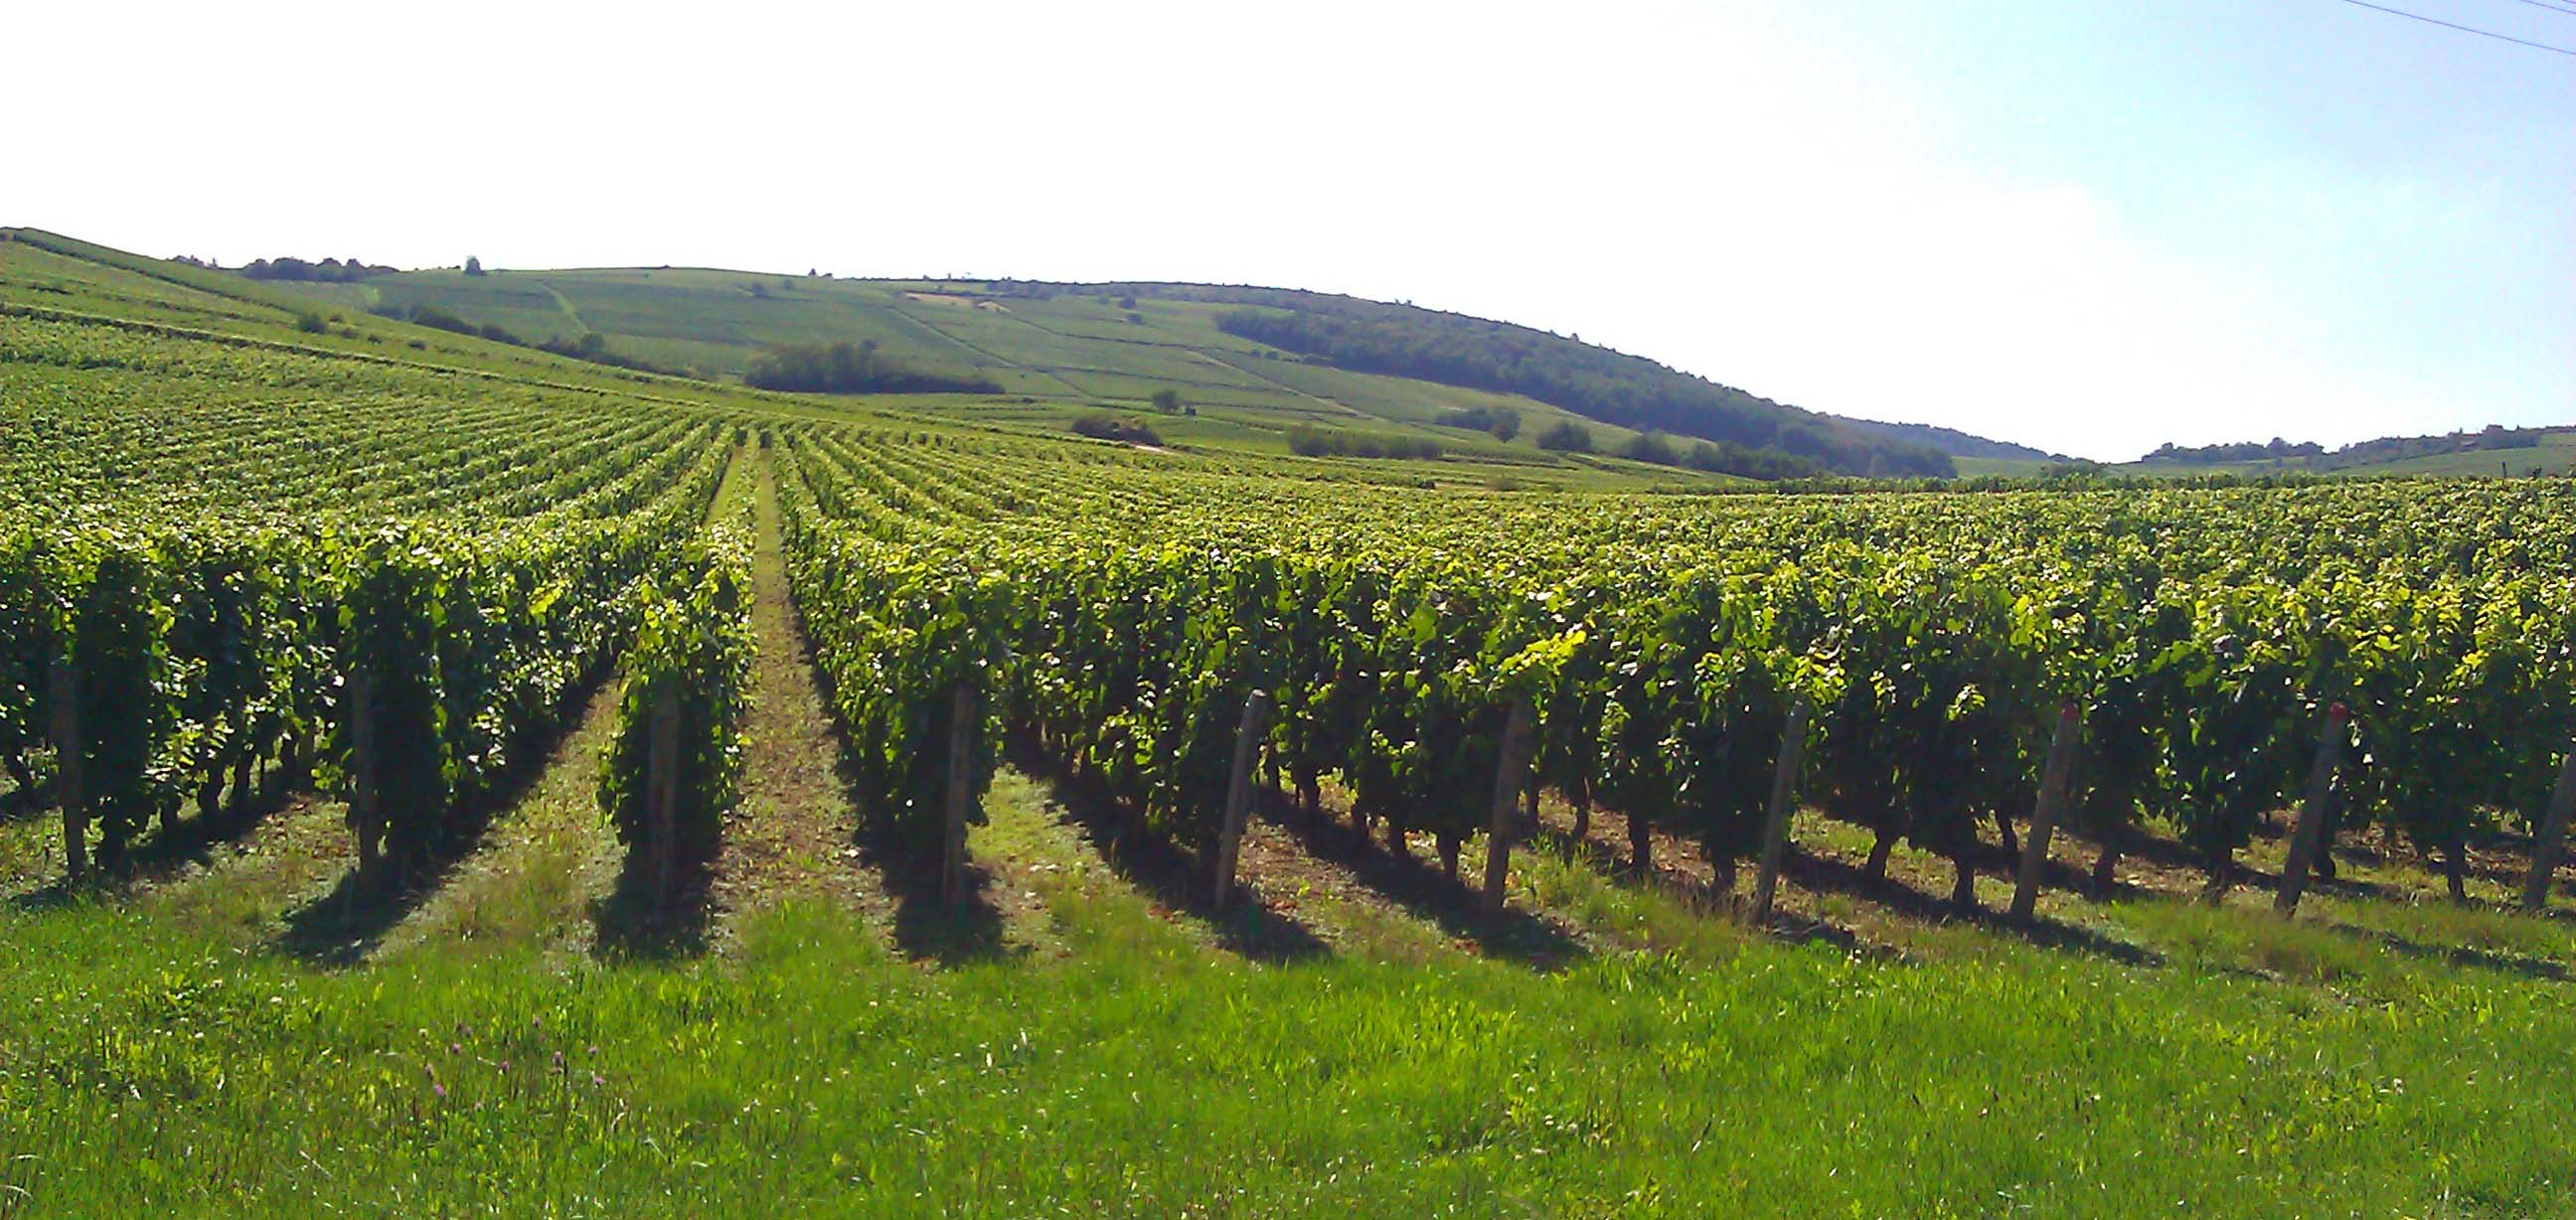 maison nicolas potel vineyard